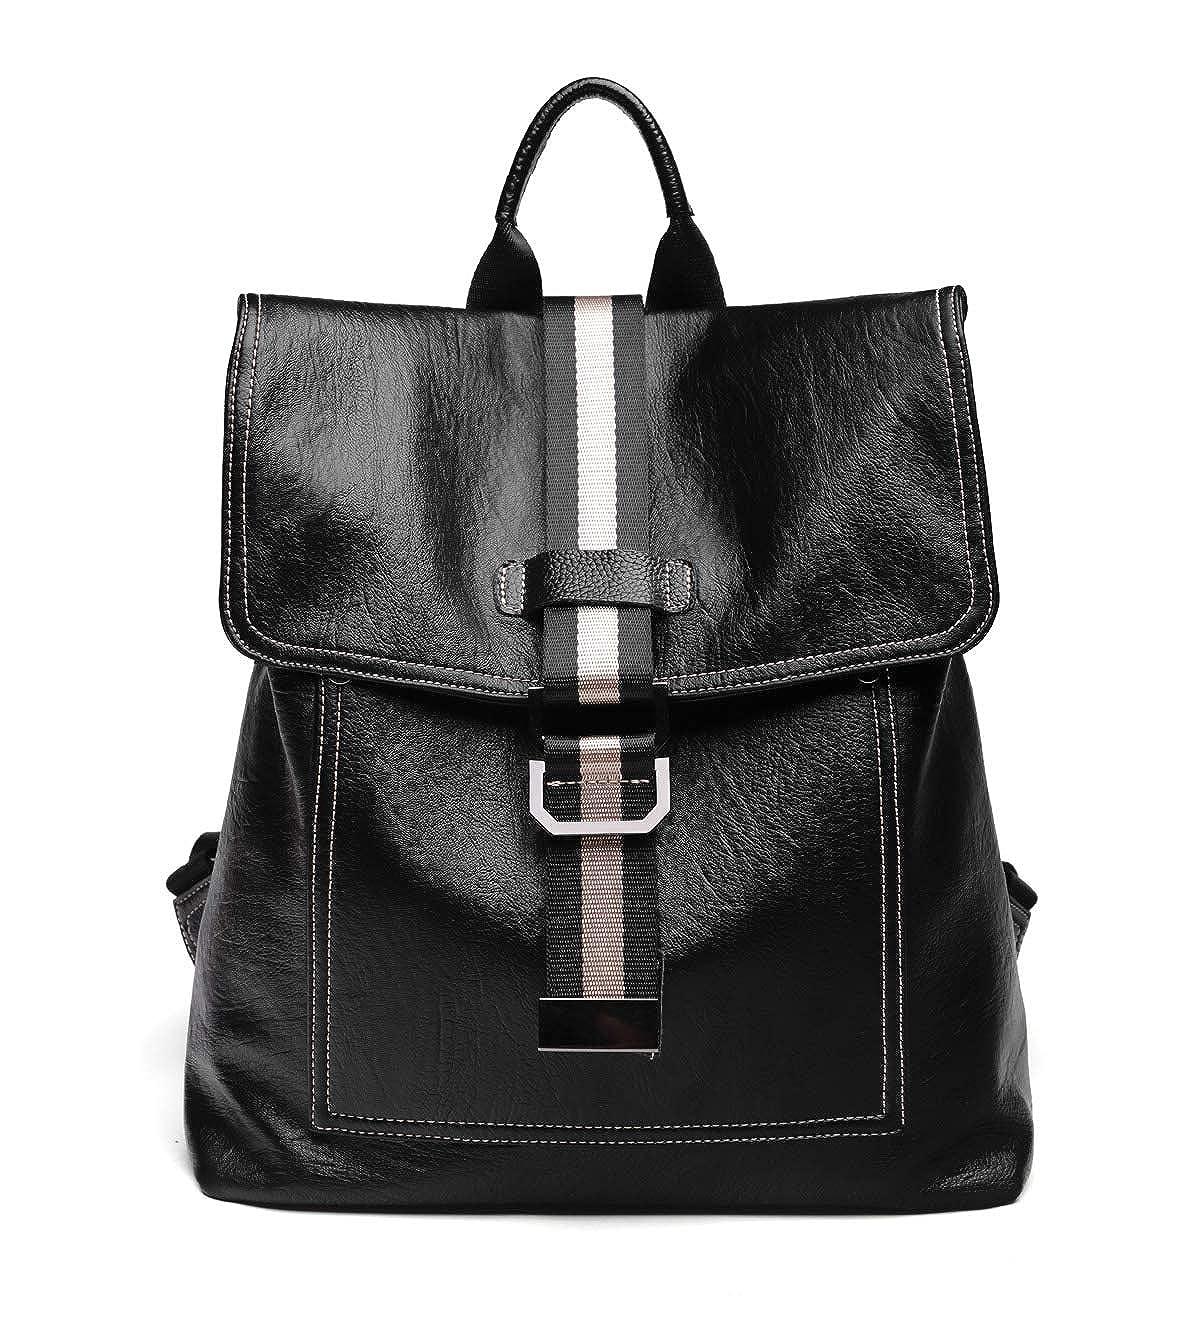 31b544b14a4a Amazon.com  XPATH Women Backpack Purse PU Soft Leather Ladies Rucksack  Casual Shoulder Bag Satchel School Bag Travel for Girls Black UBG47  Shoes